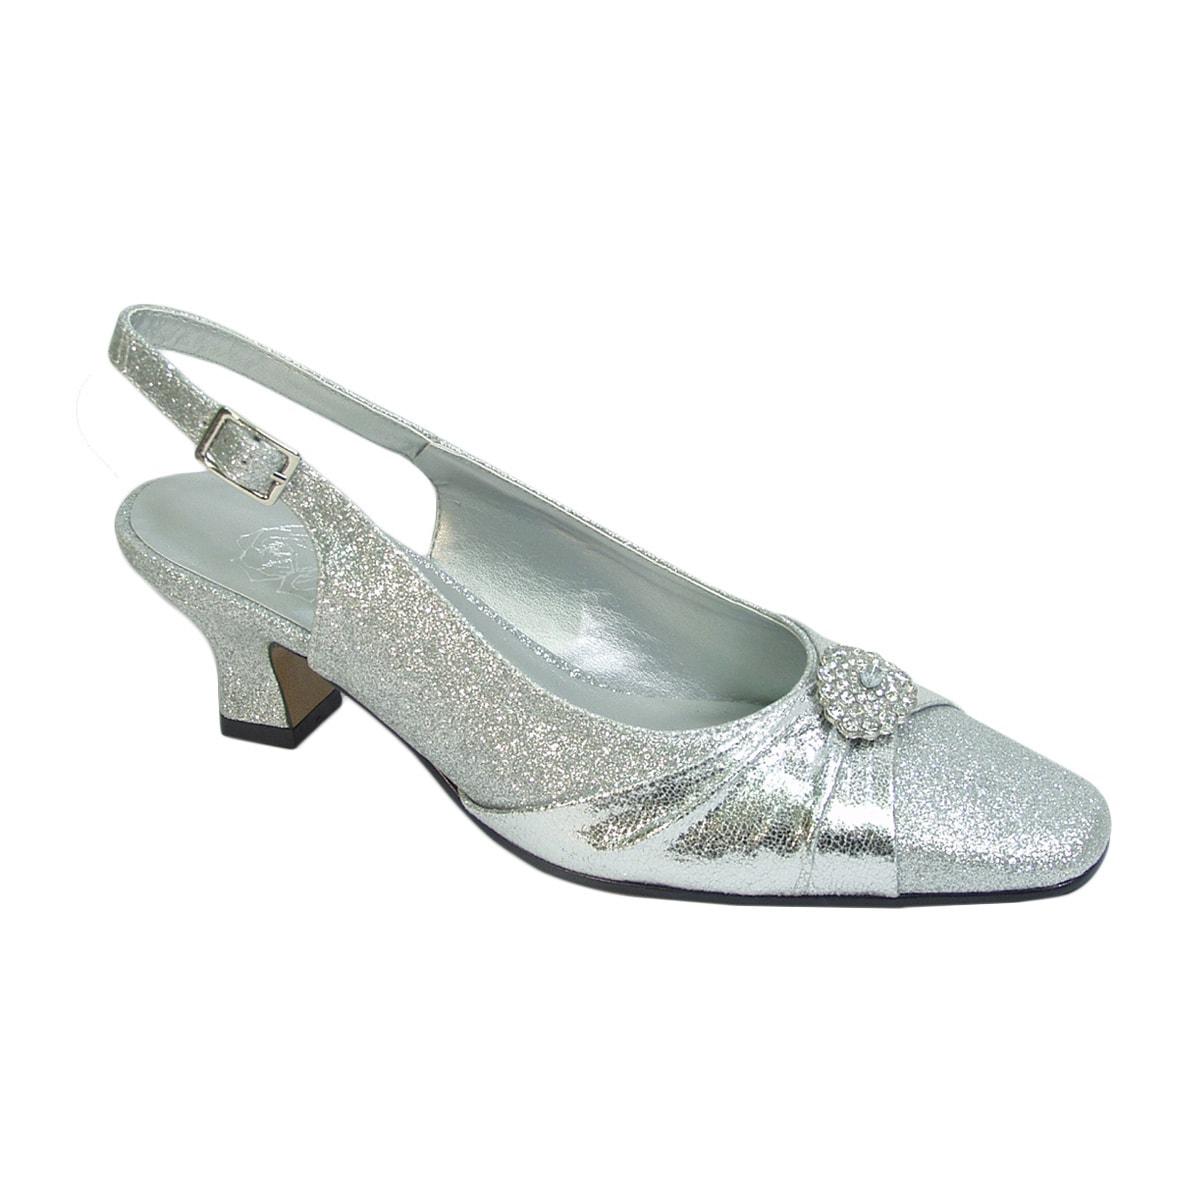 6cd23c1b1ca Shop FIC FLORAL Elaine Women s Extra Wide Width Dress Shoes - Free ...